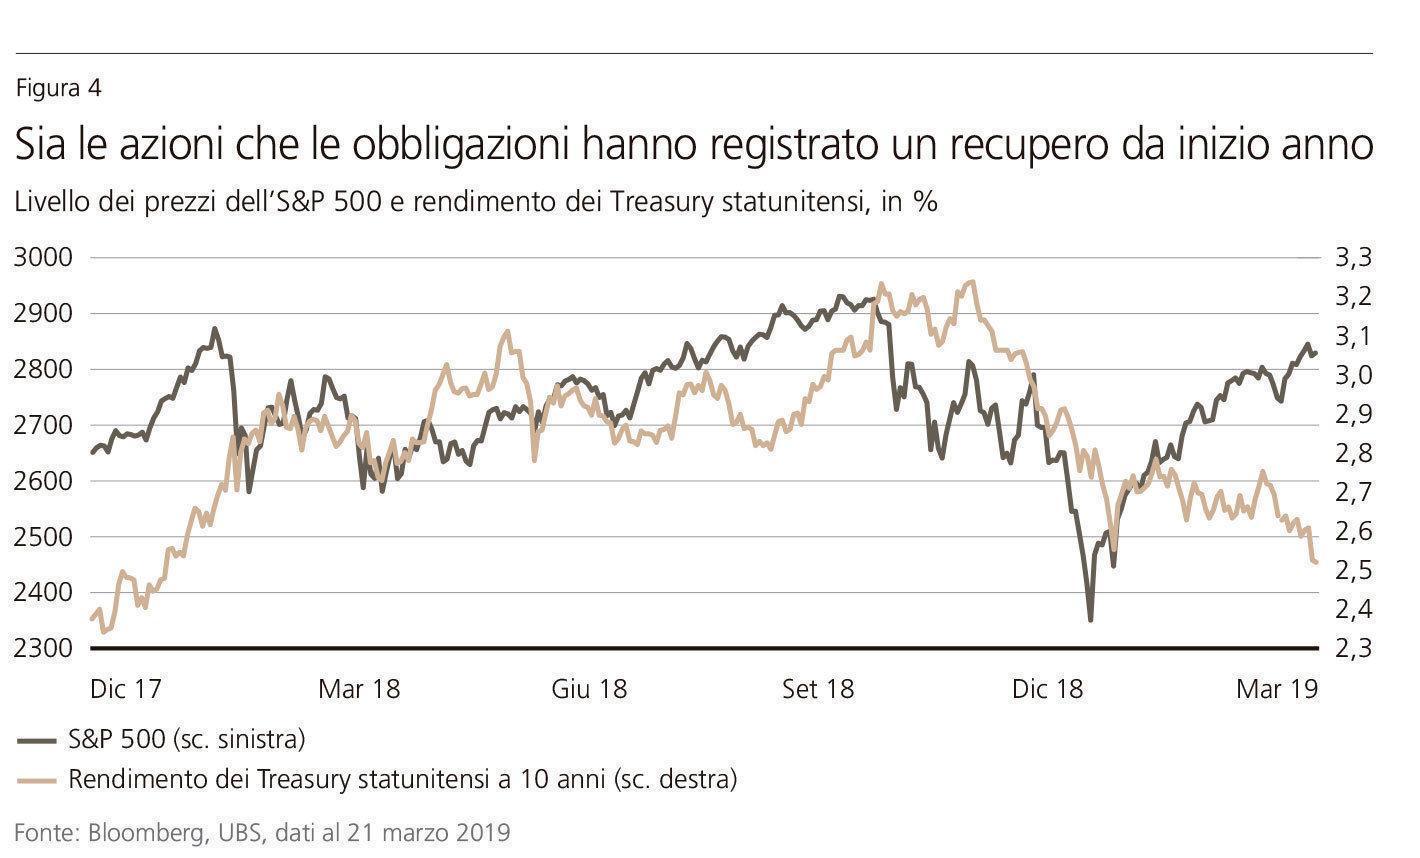 Treasury/S&P500